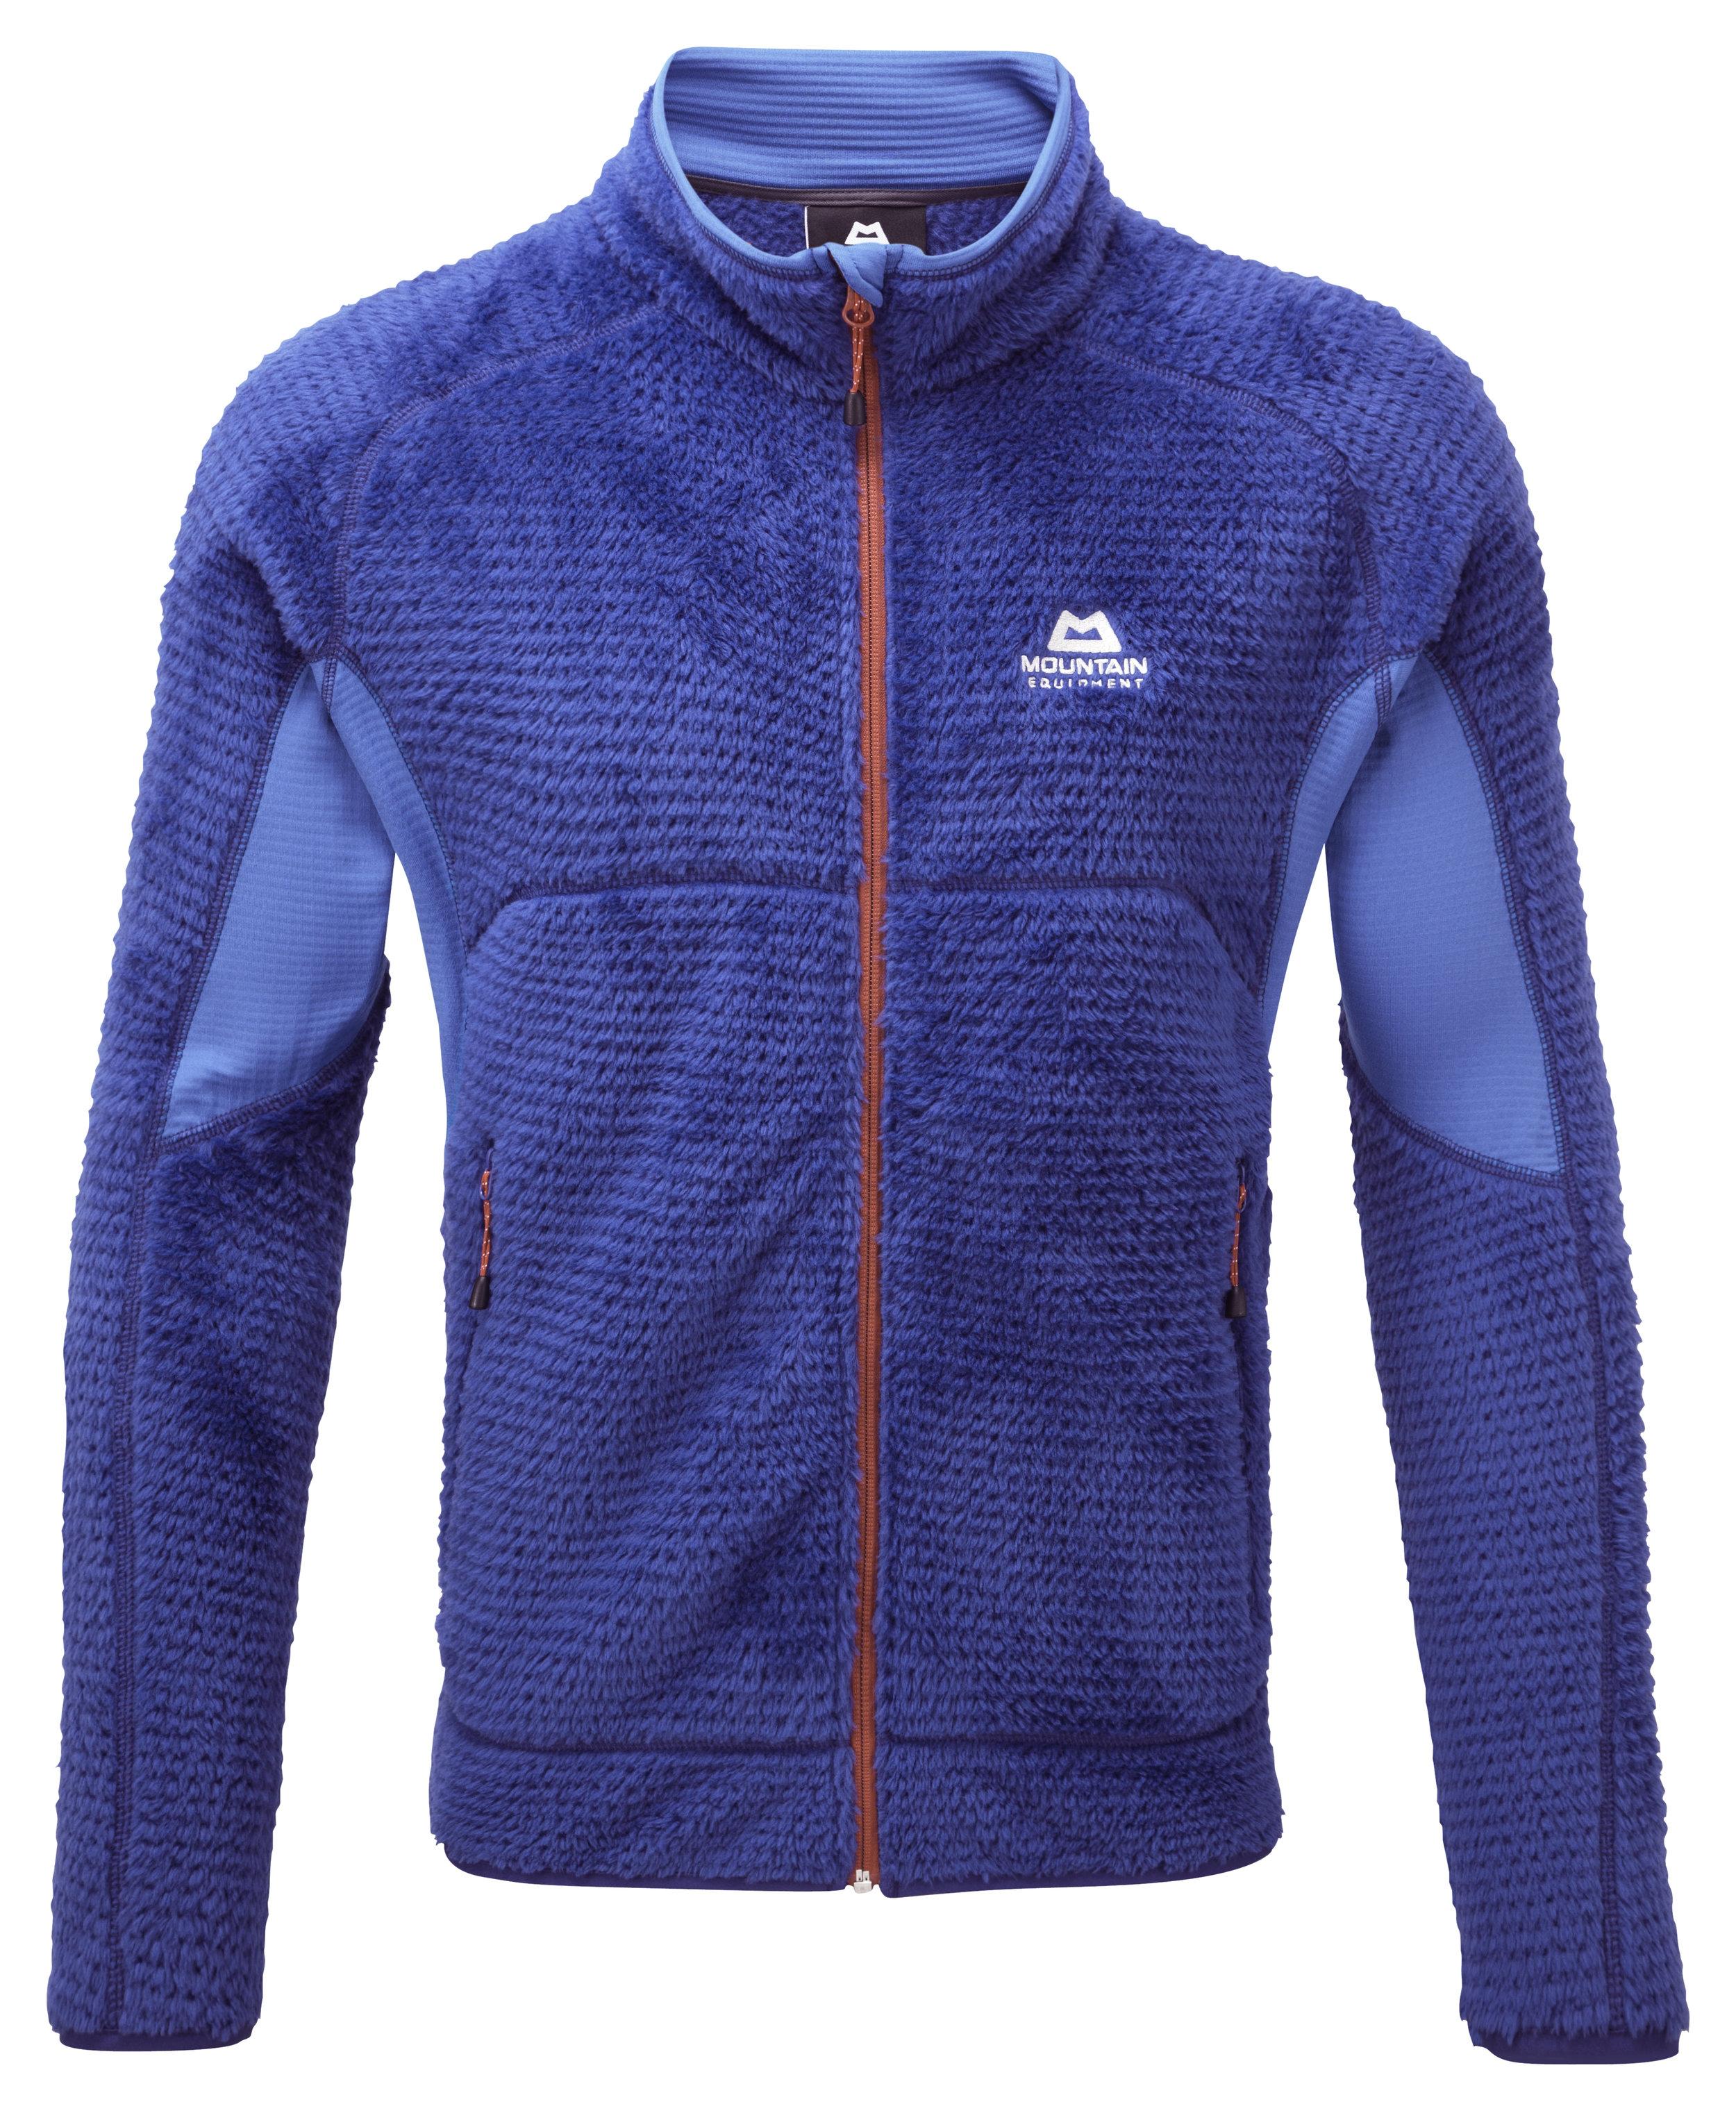 Mountain Equipment Concordia jacket